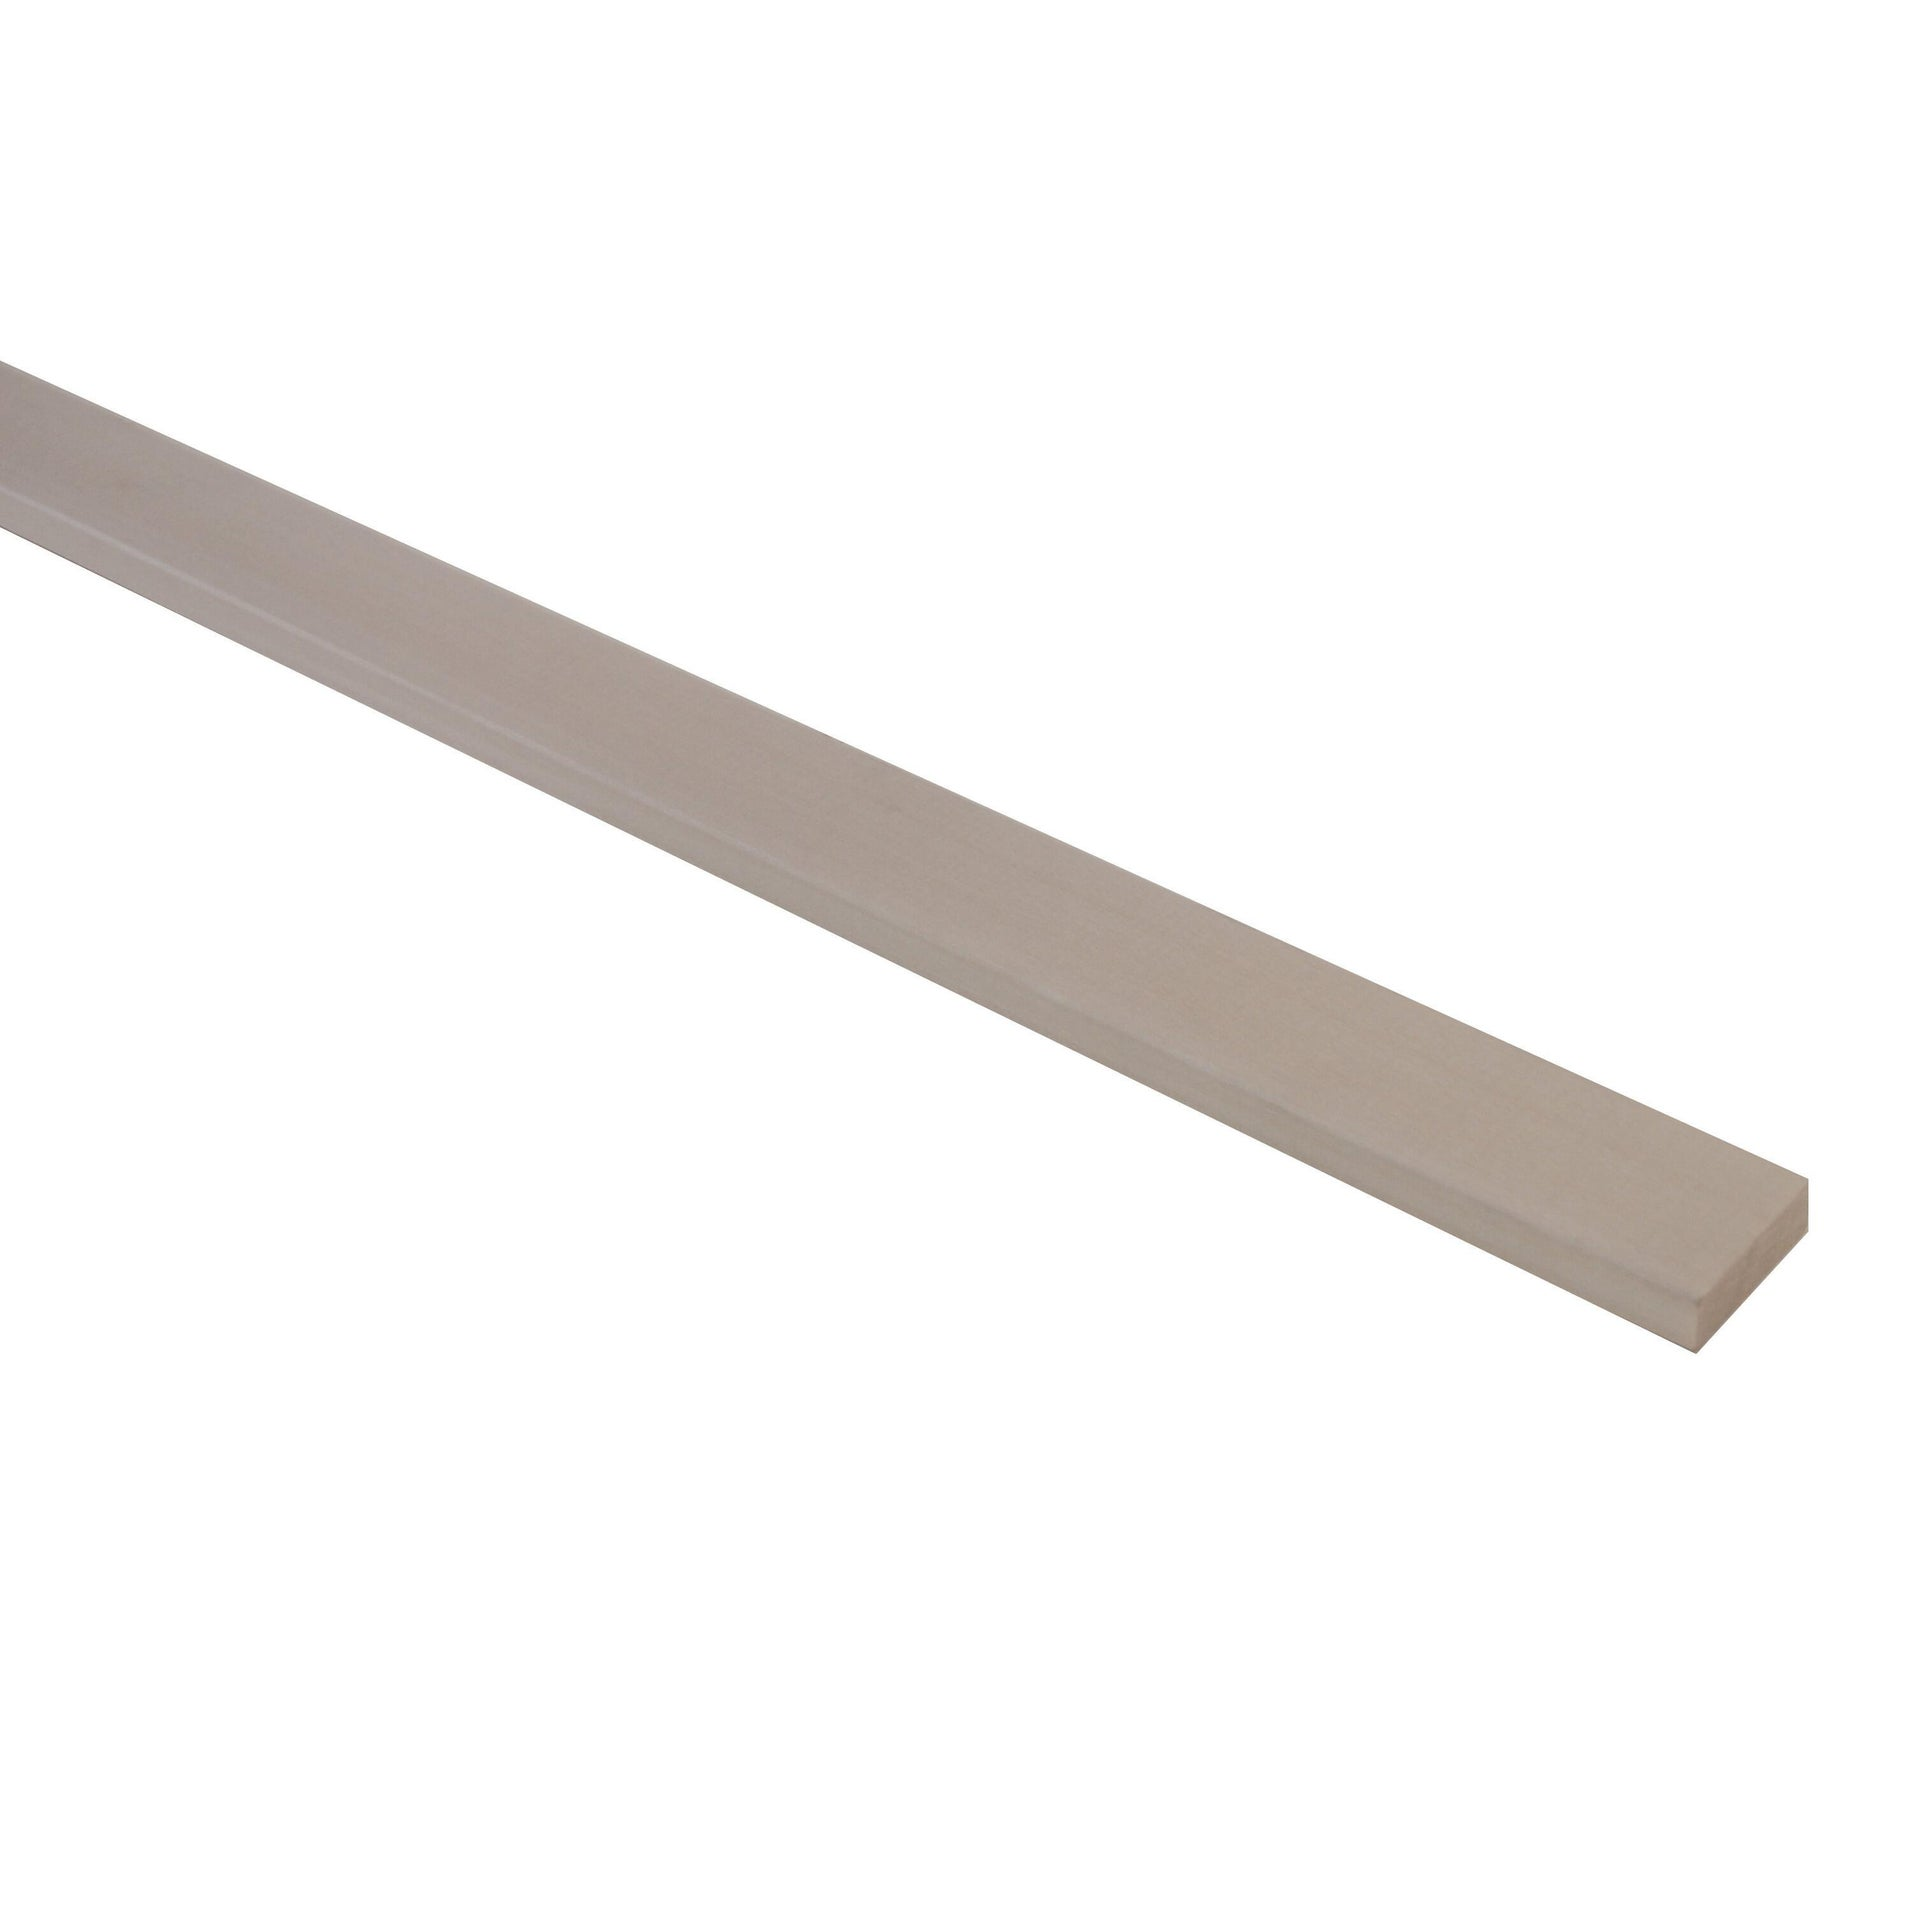 Listello piallato ayous 1 m x 20 mm, Sp 10 mm